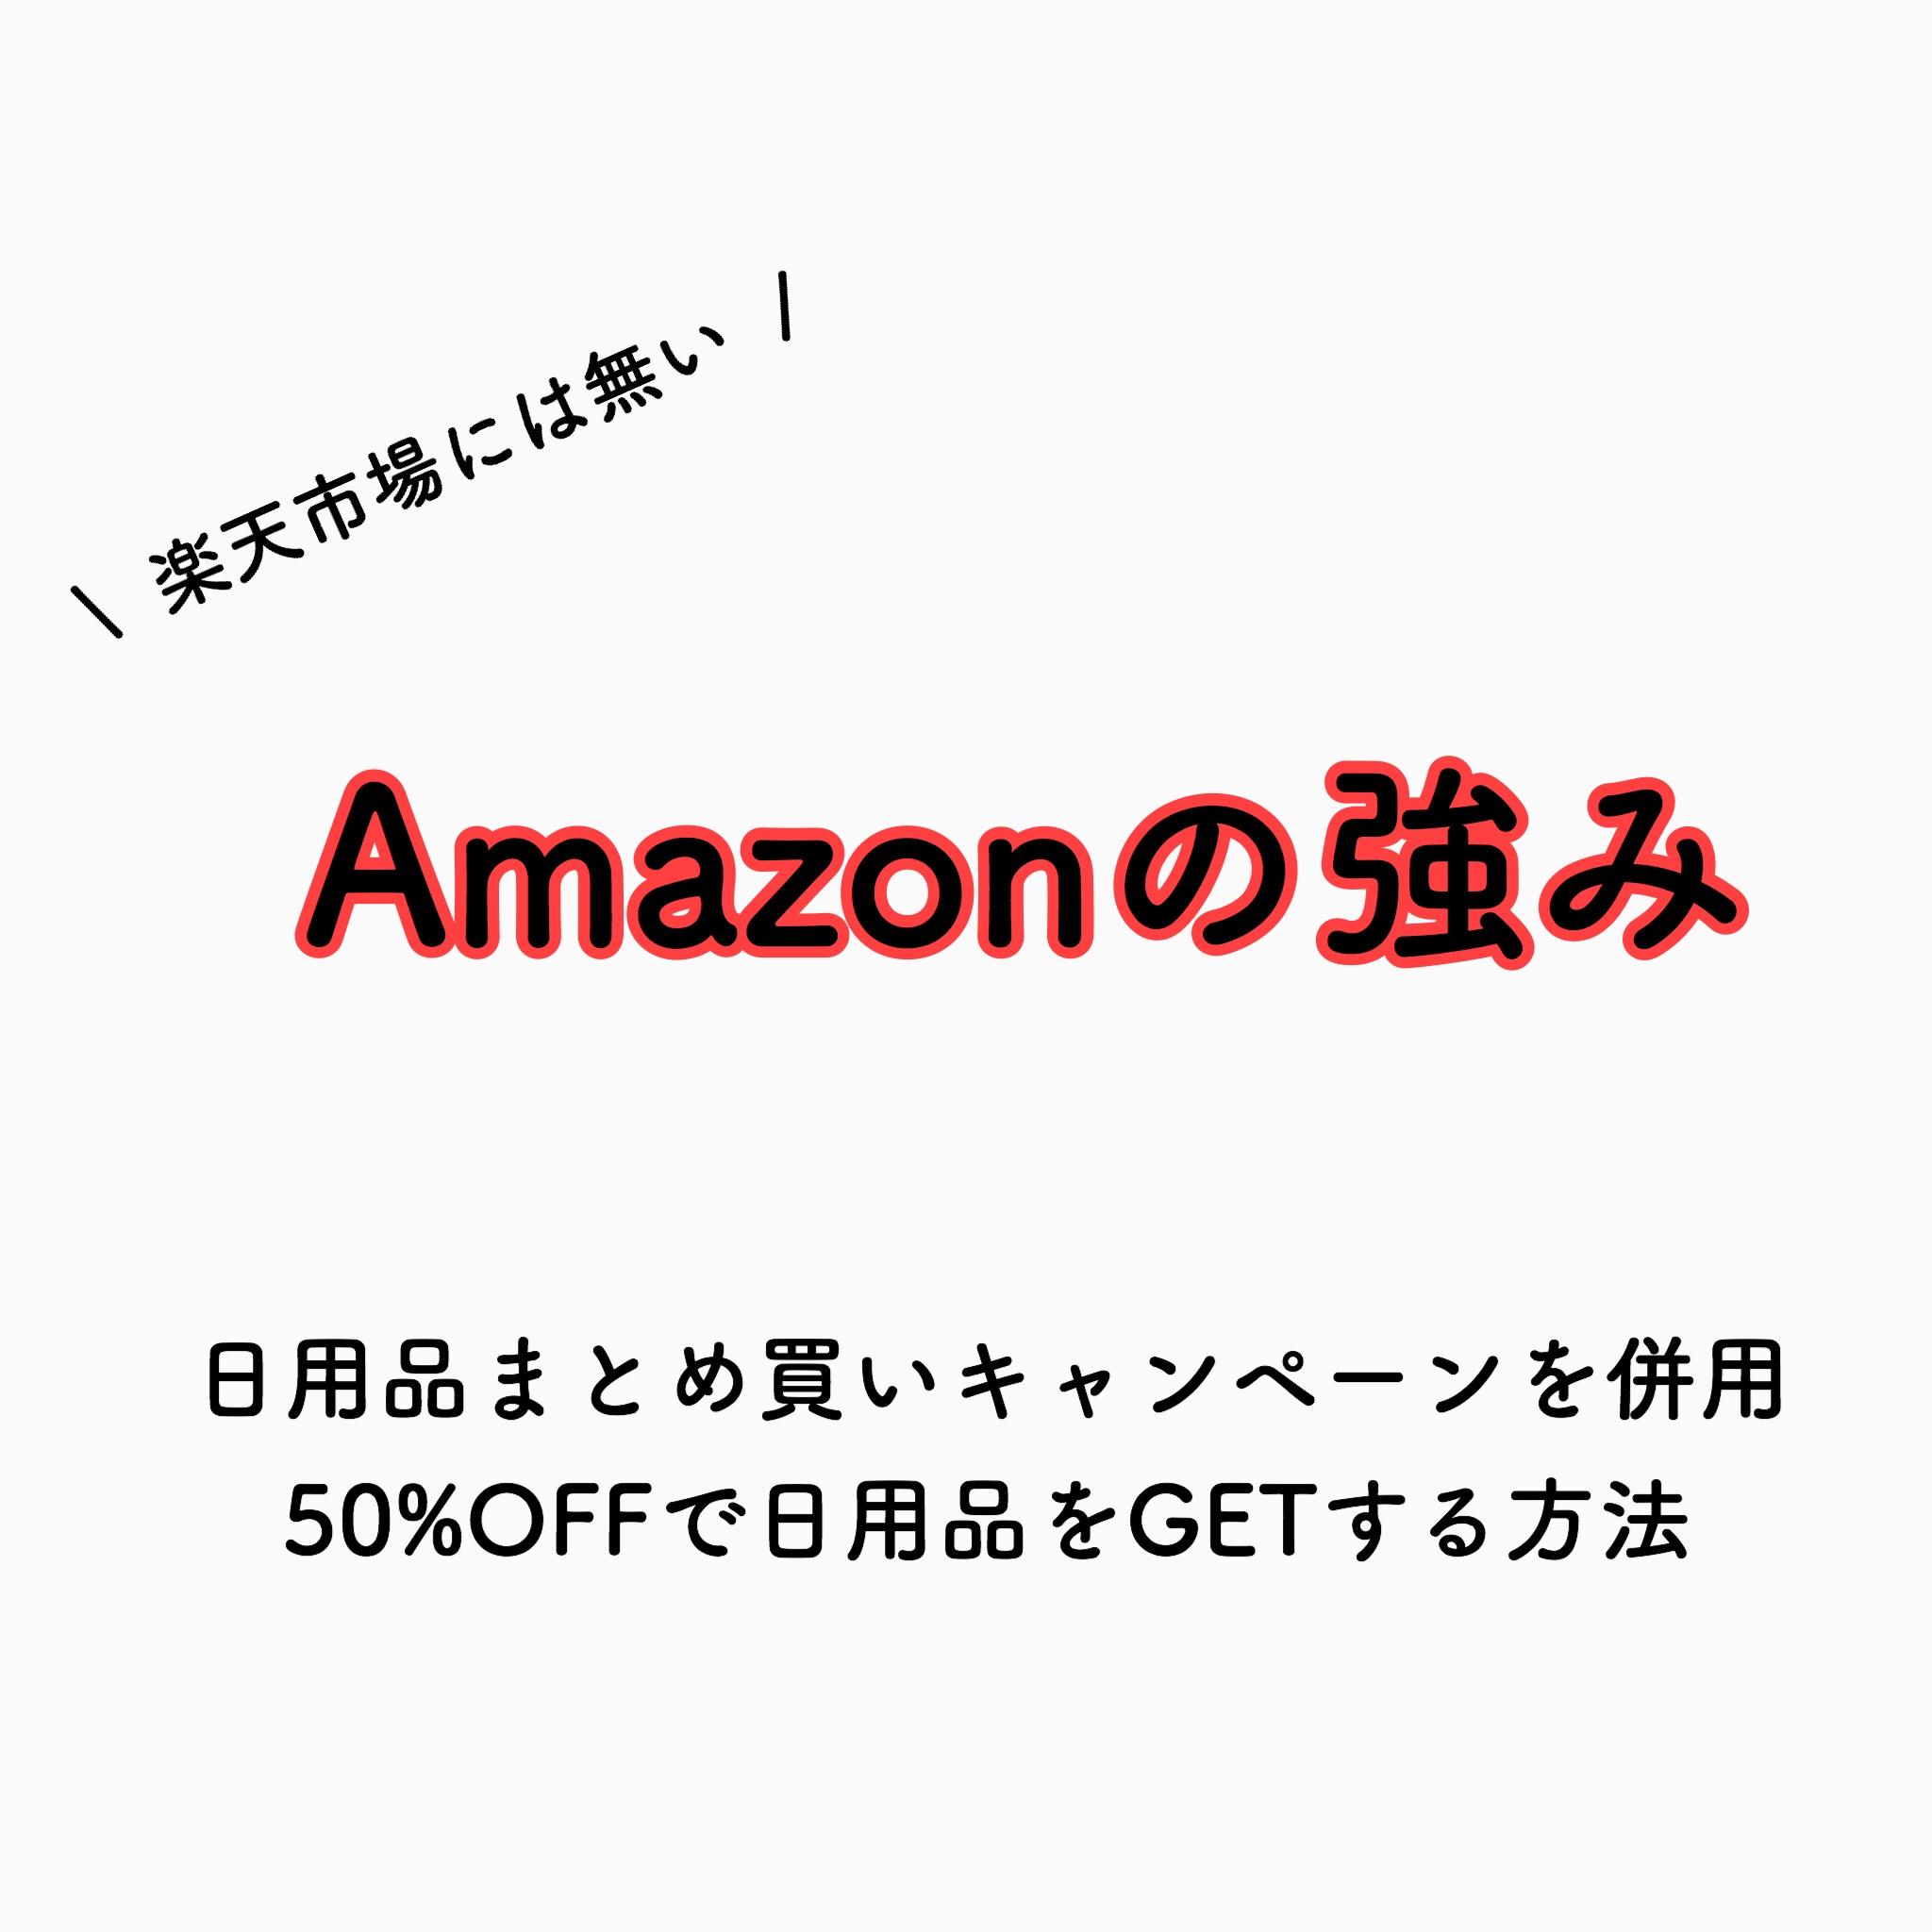 Amazon プライム会員 お得 裏技 割引き キャンペーン